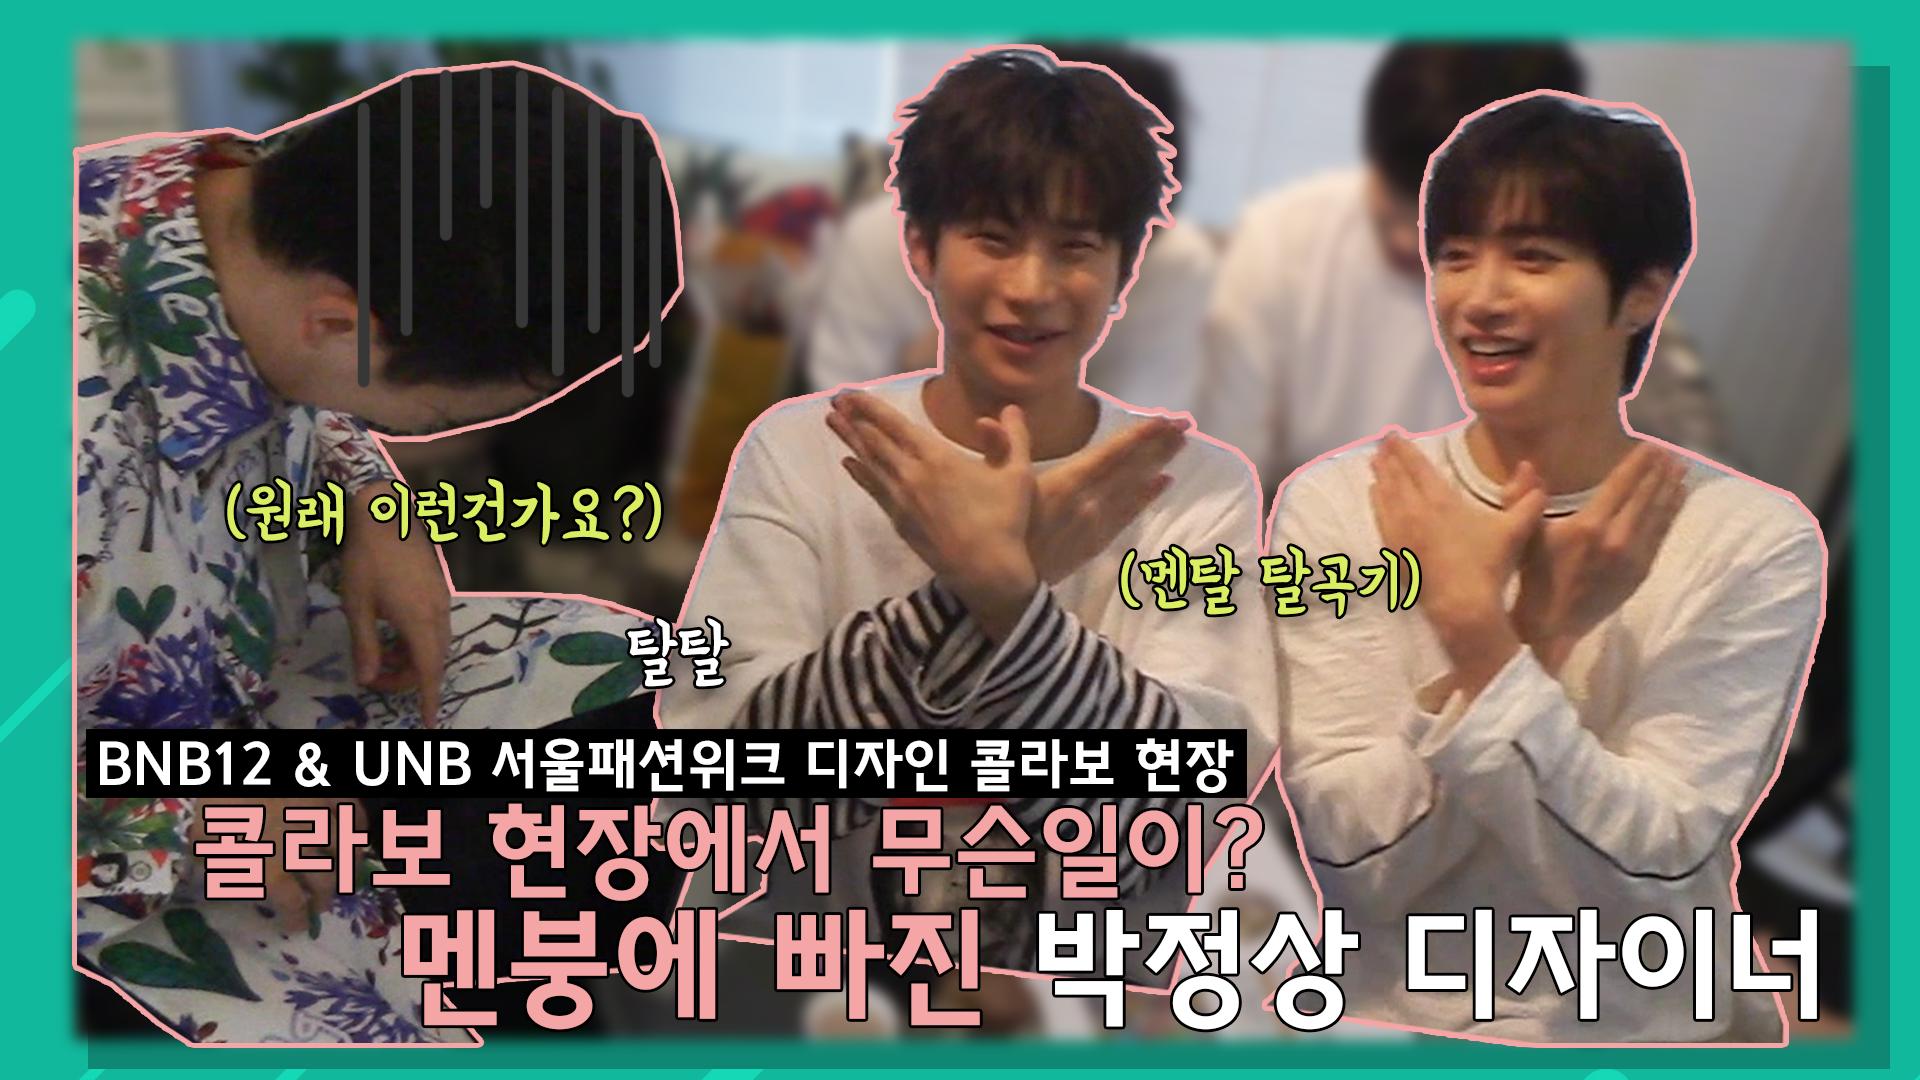 [BNB12&UNB 서울패션위크 콜라보] 멘탈 탈탈 털린 박정상 디자이너?